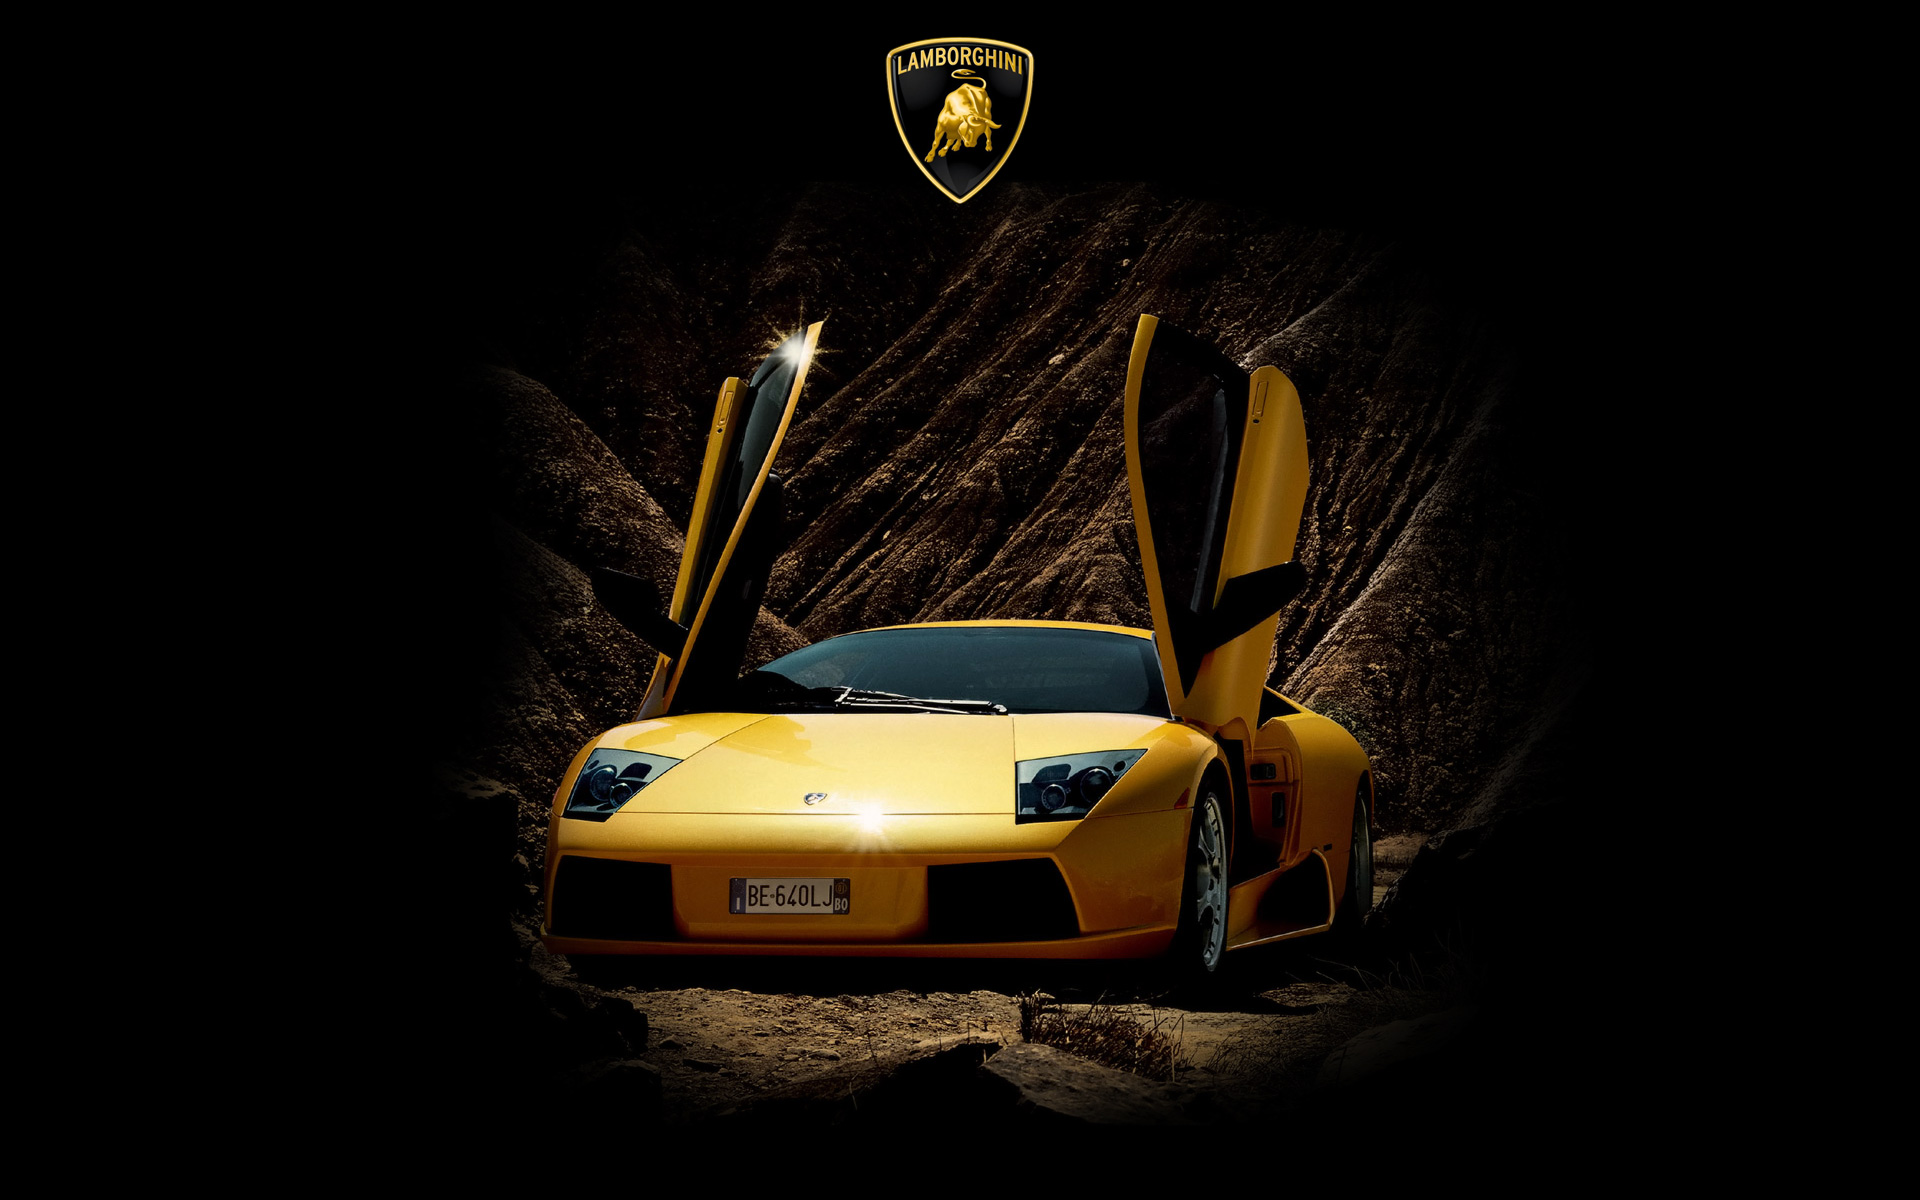 Lamborghini Murcielago Wallpaper Image Le Fancy Wallpapers Mod Db